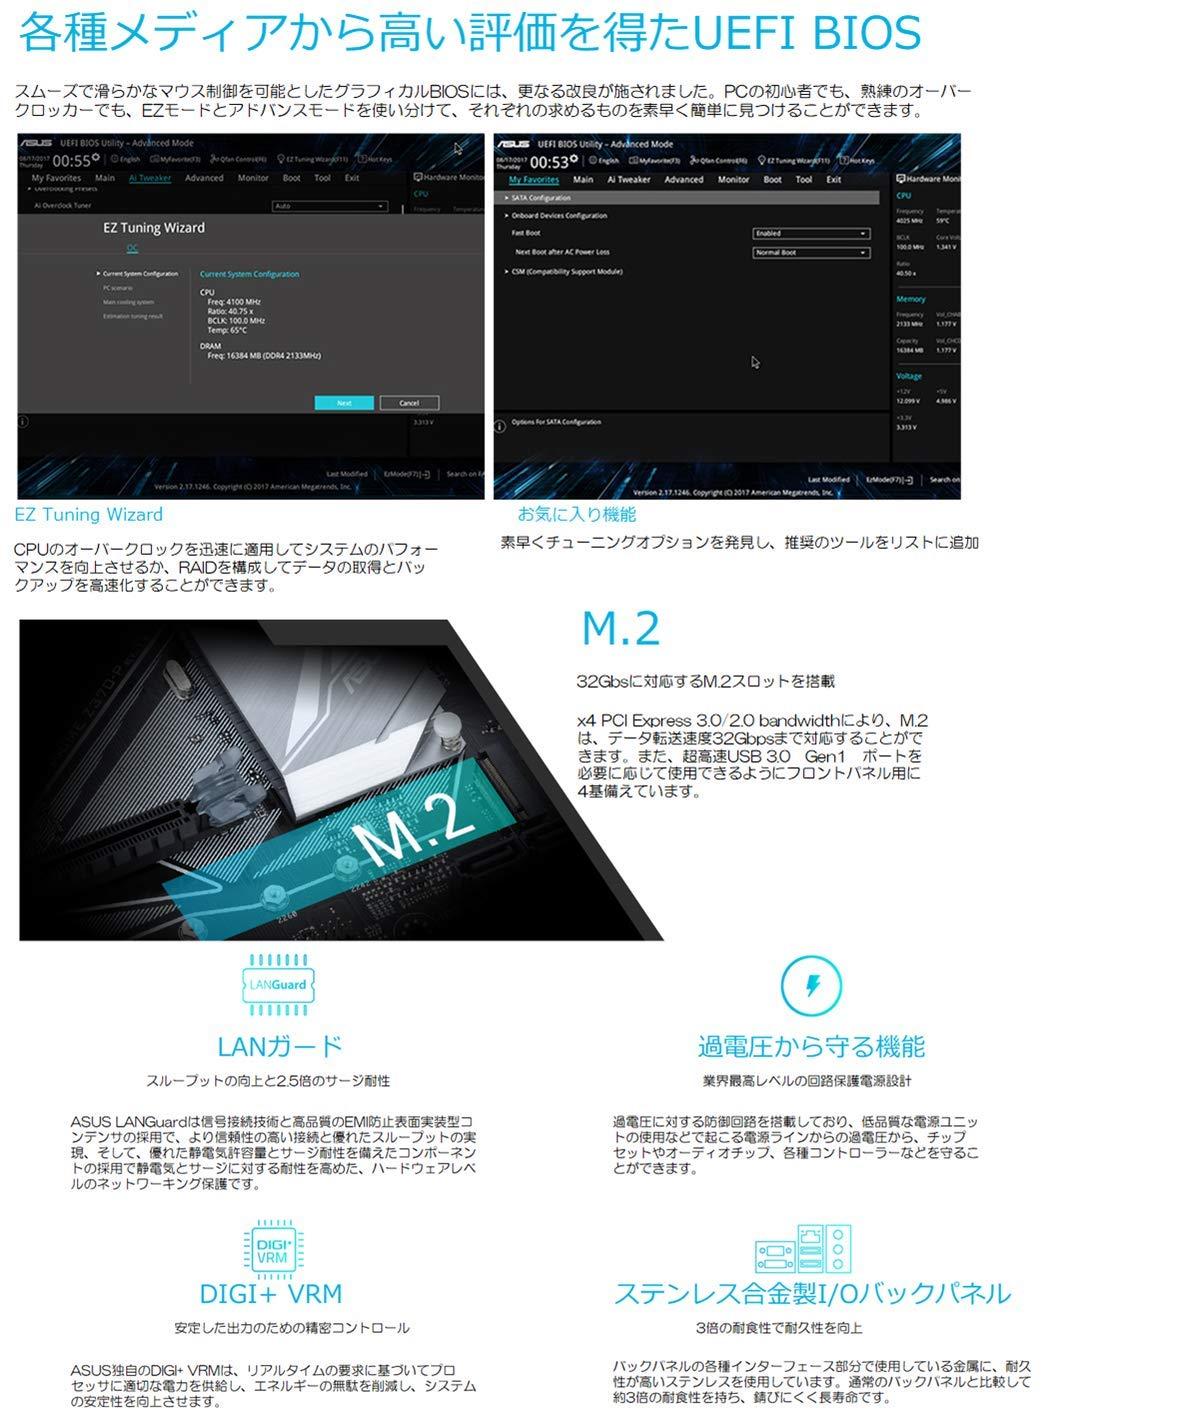 ASUS Prime Z370-P LGA1151 DDR4 HDMI DVI M 2 Z370 ATX Motherboard with USB  3 1 for 8th Generation Intel Core Processors